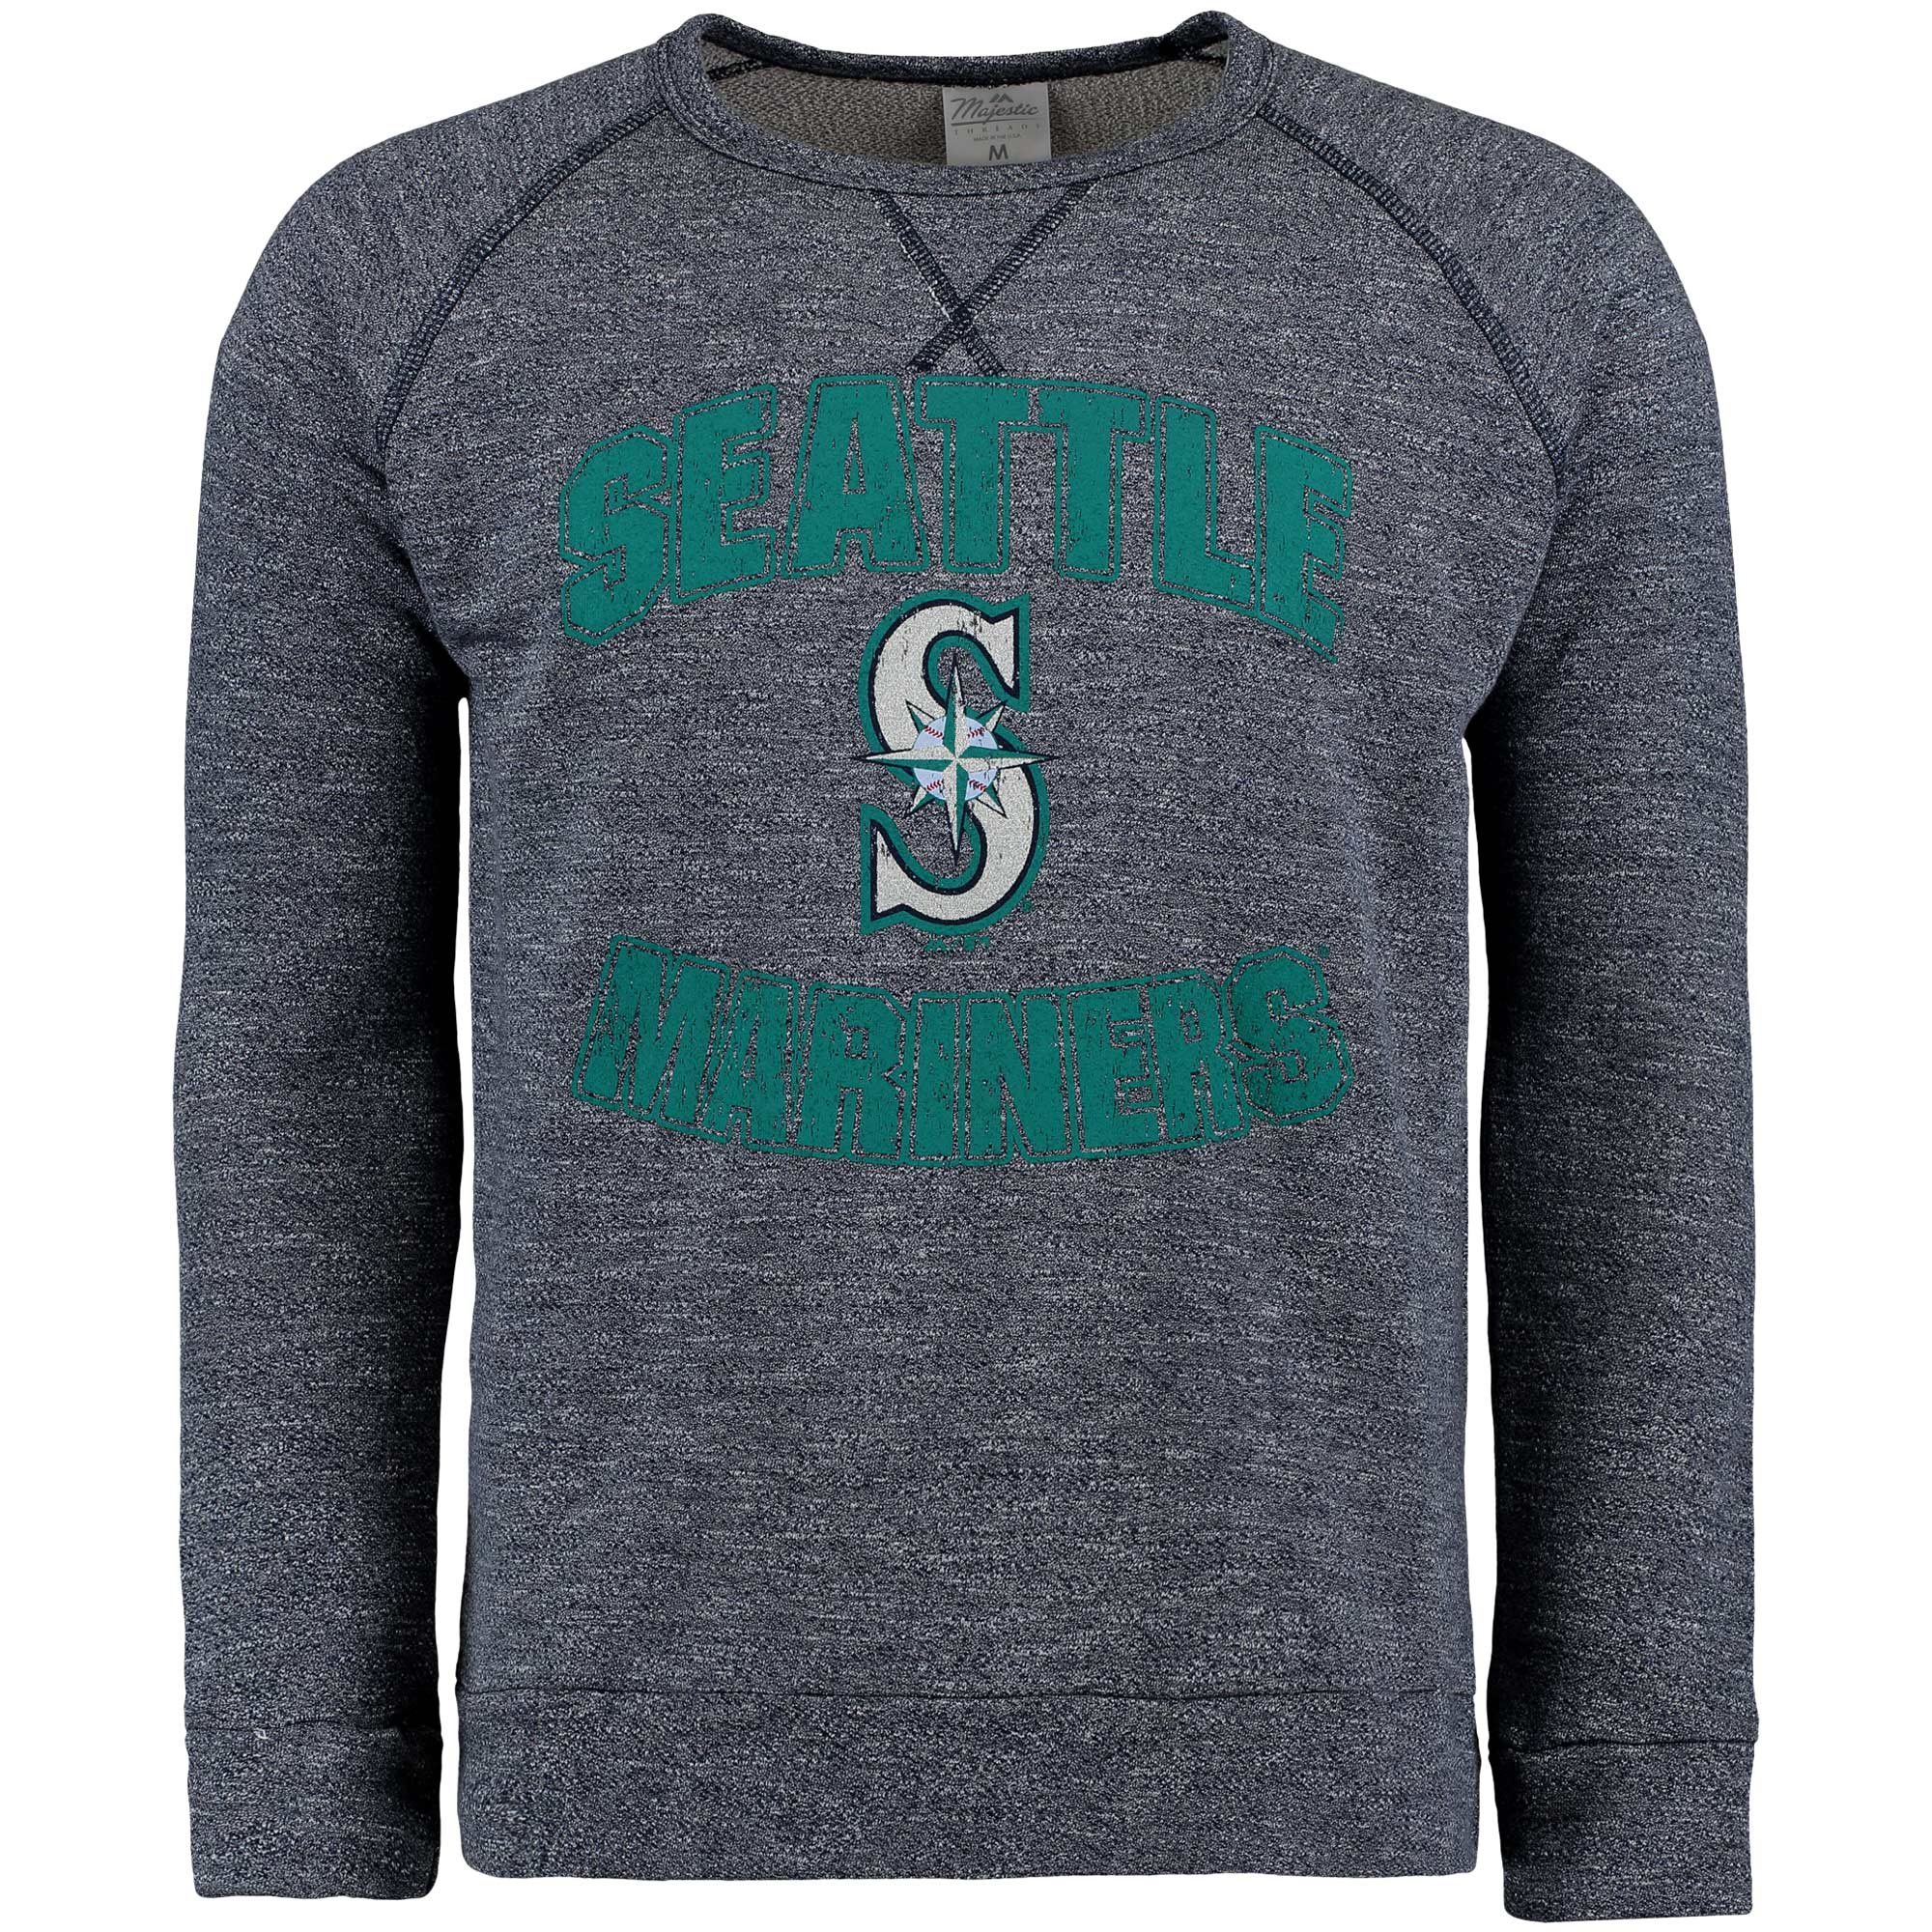 Seattle Mariners Majestic Threads Team Favorite French Terry Raglan Sleeve Sweatshirt - Navy